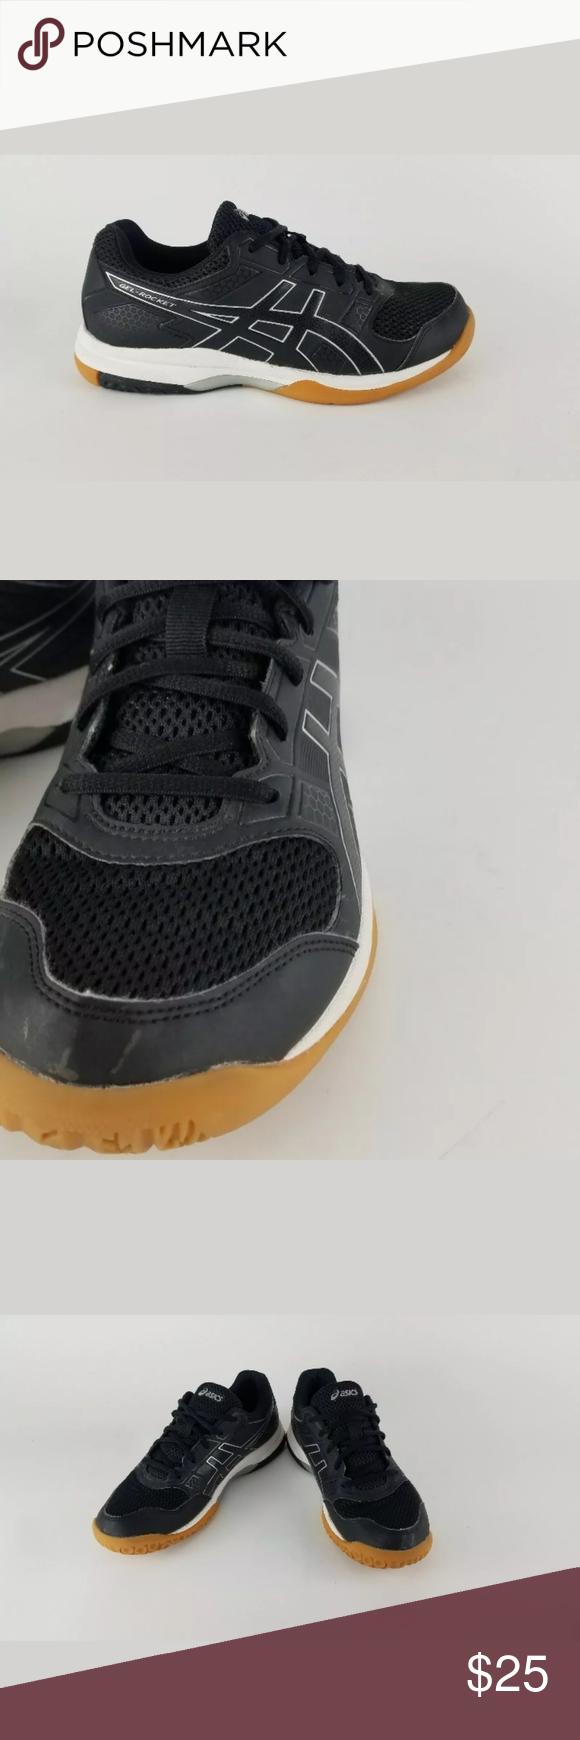 Asics Gel Rocket Volleyball Shoes Black W Sz 8 5 Black Shoes Volleyball Shoes Womens Shoes Sneakers